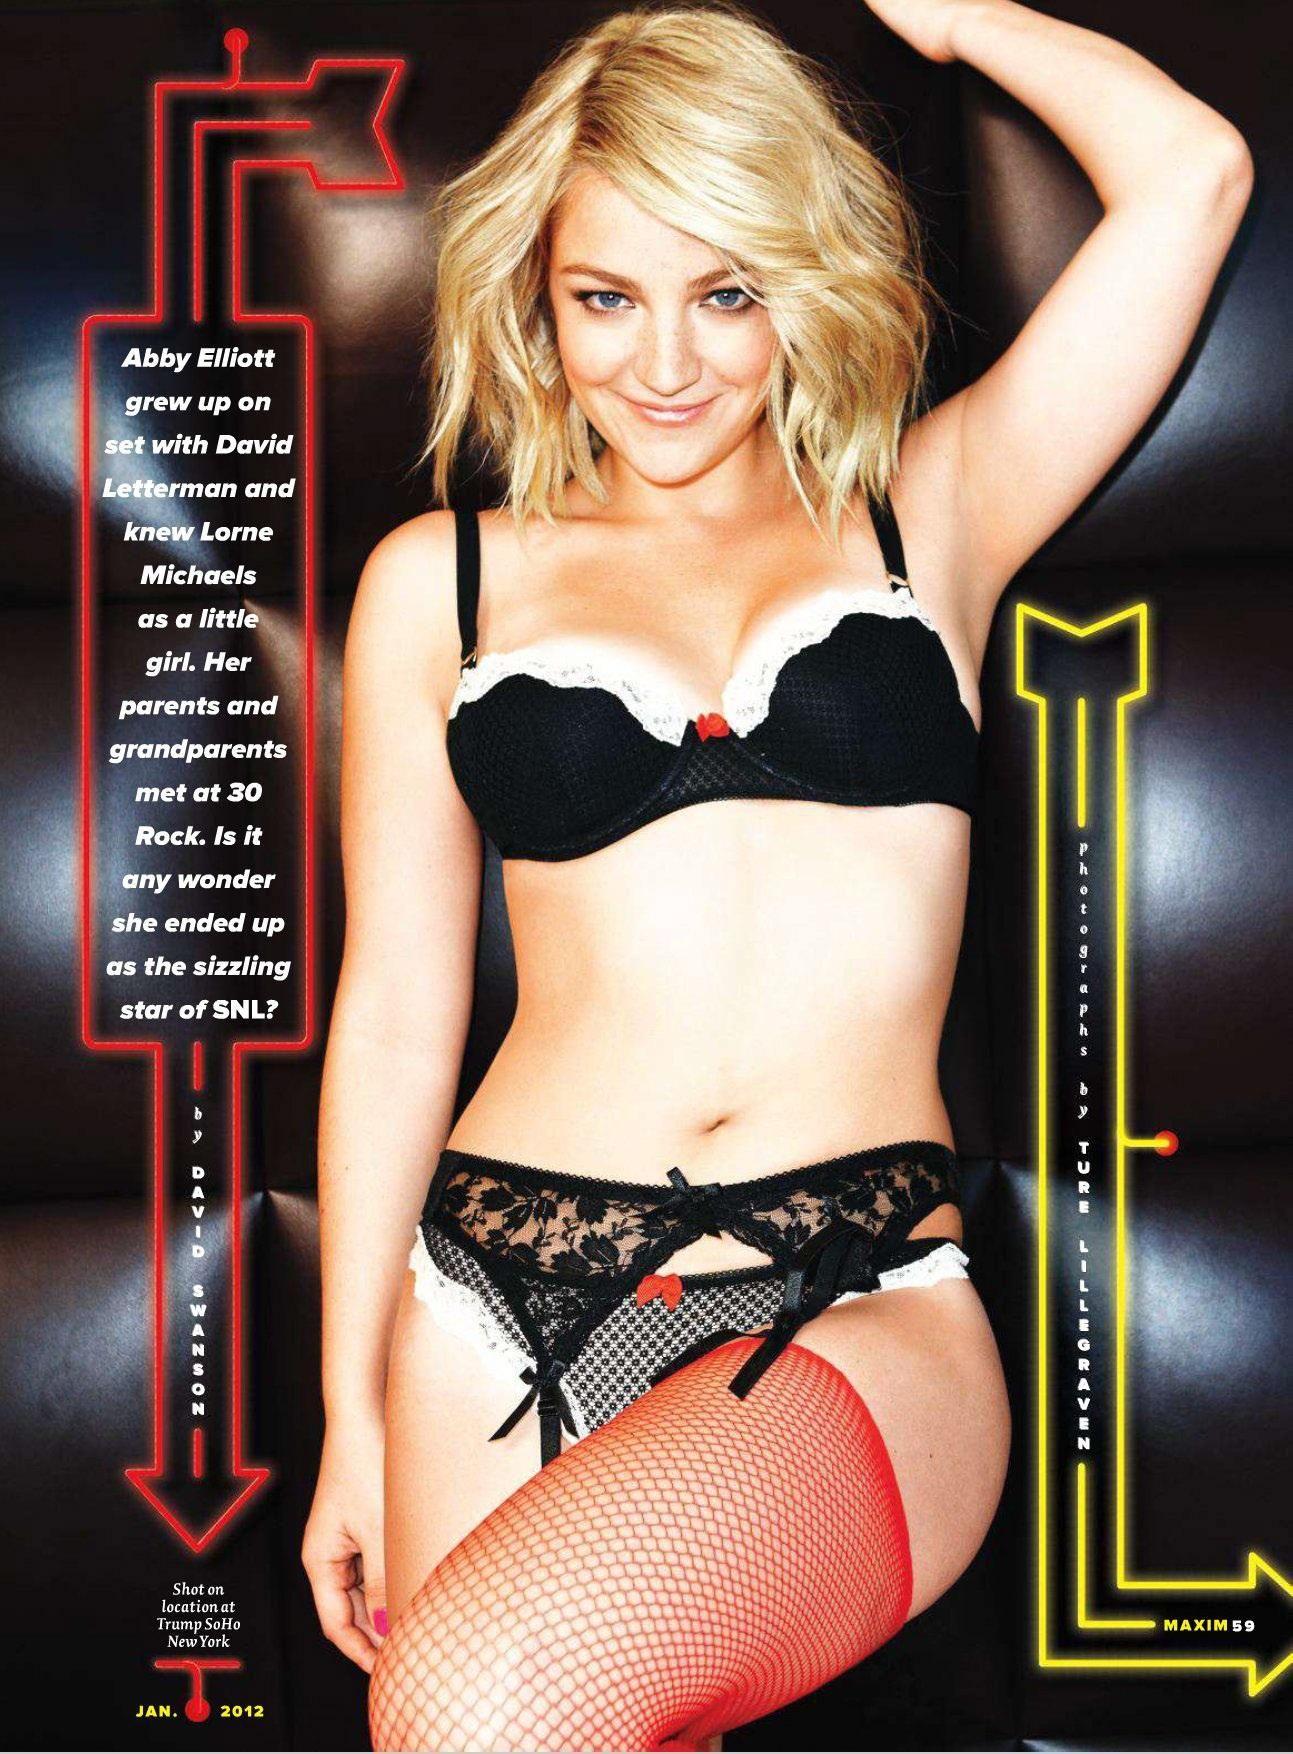 Bikini Abby Elliott nude (57 photo), Topless, Paparazzi, Boobs, panties 2006